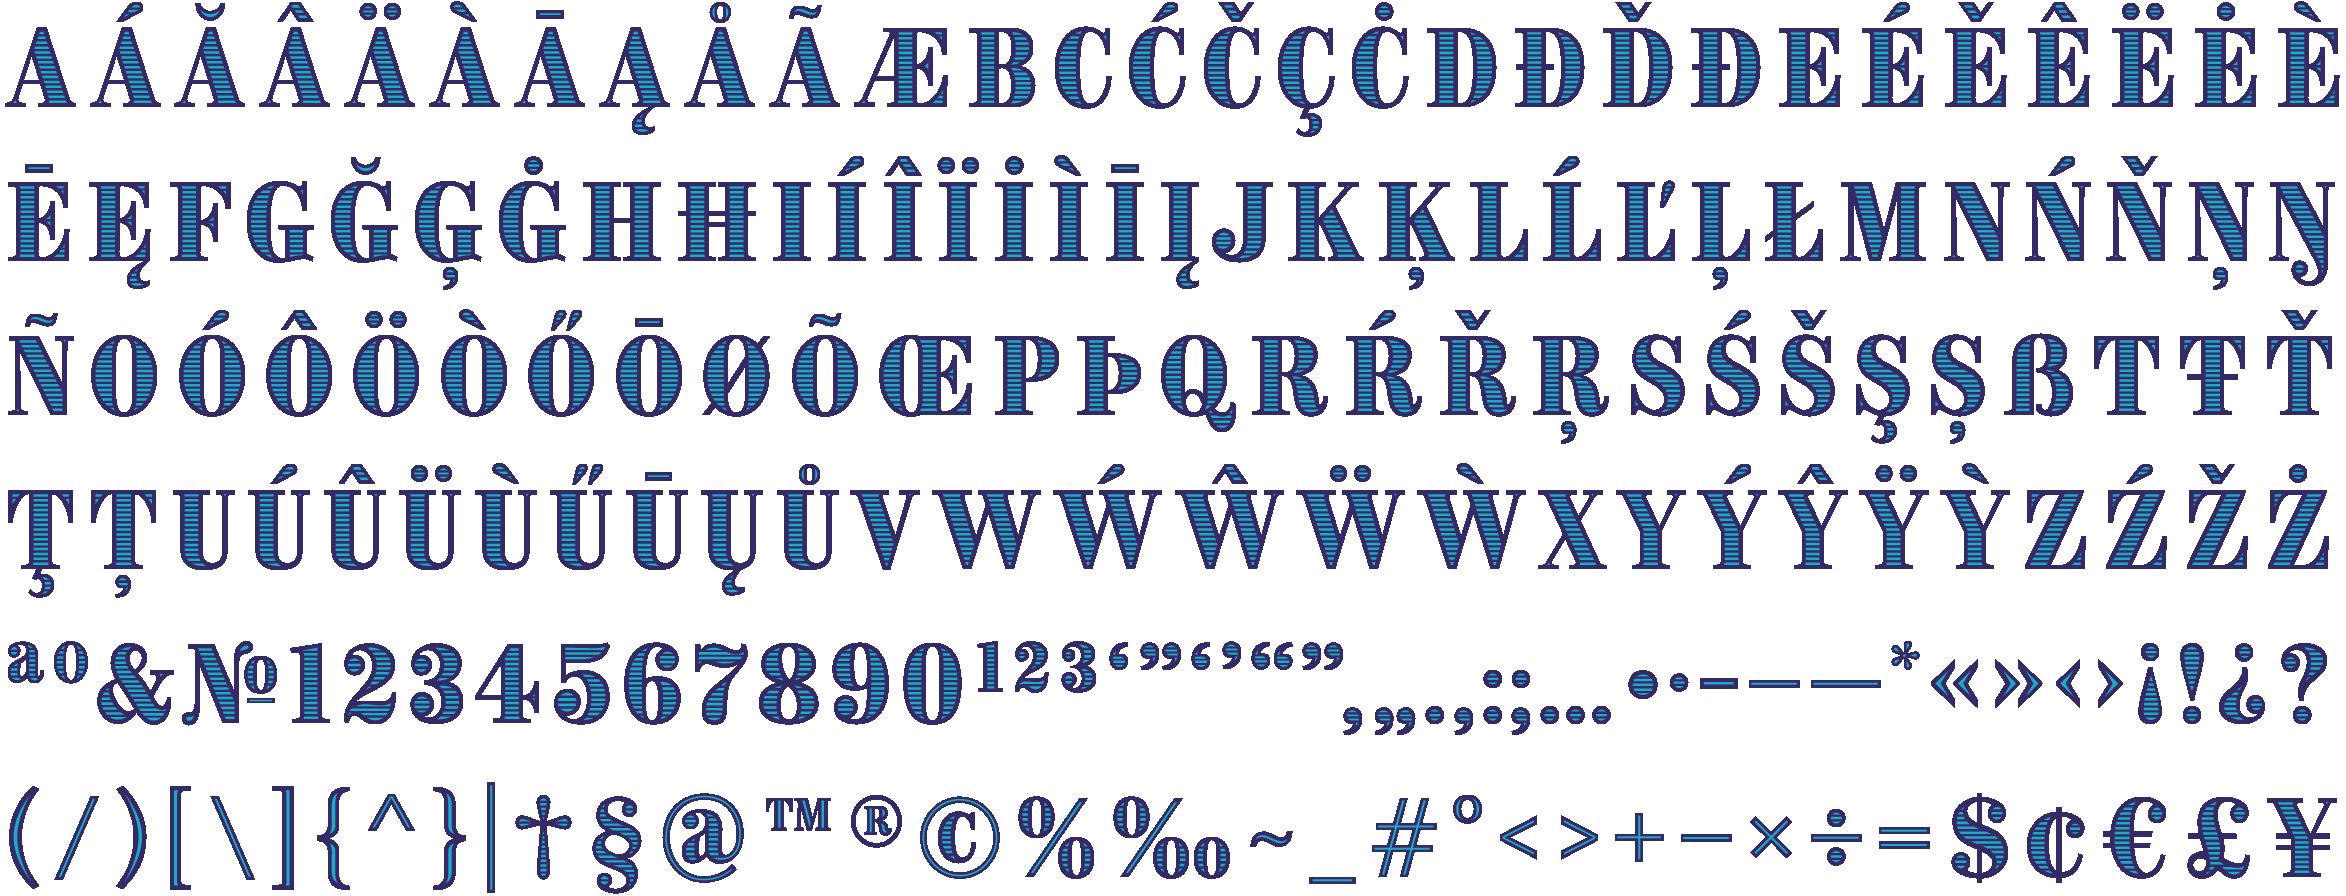 Image 11 character set